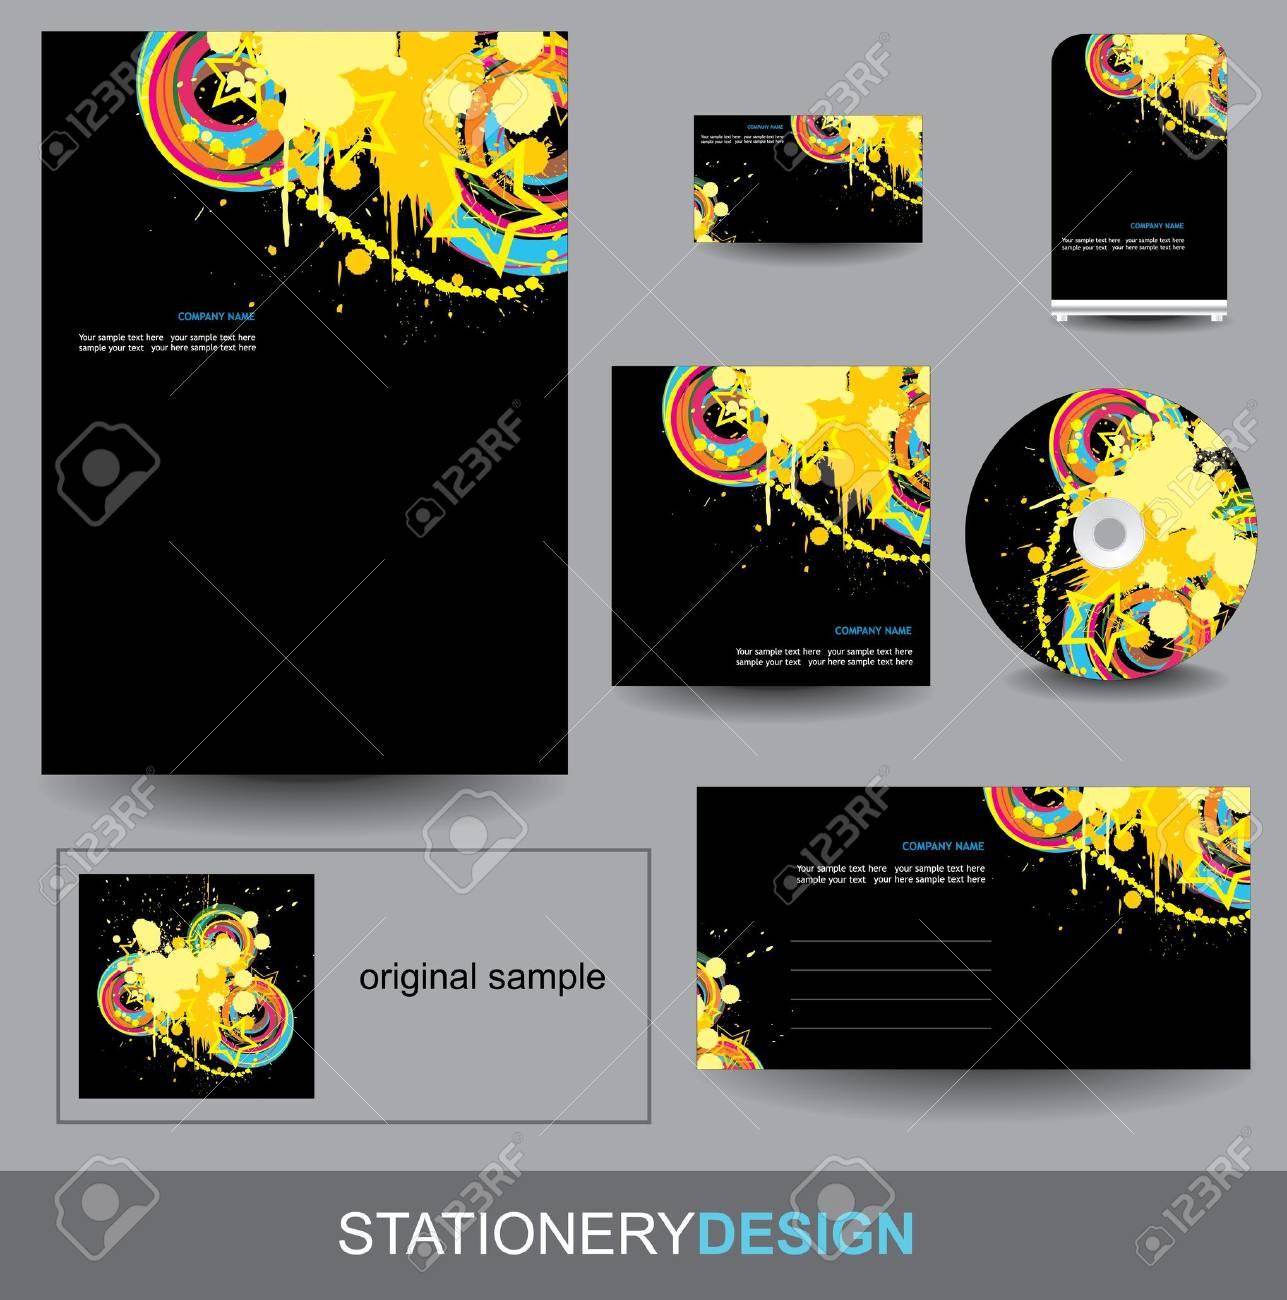 Stationery design set Stock Vector - 15556468